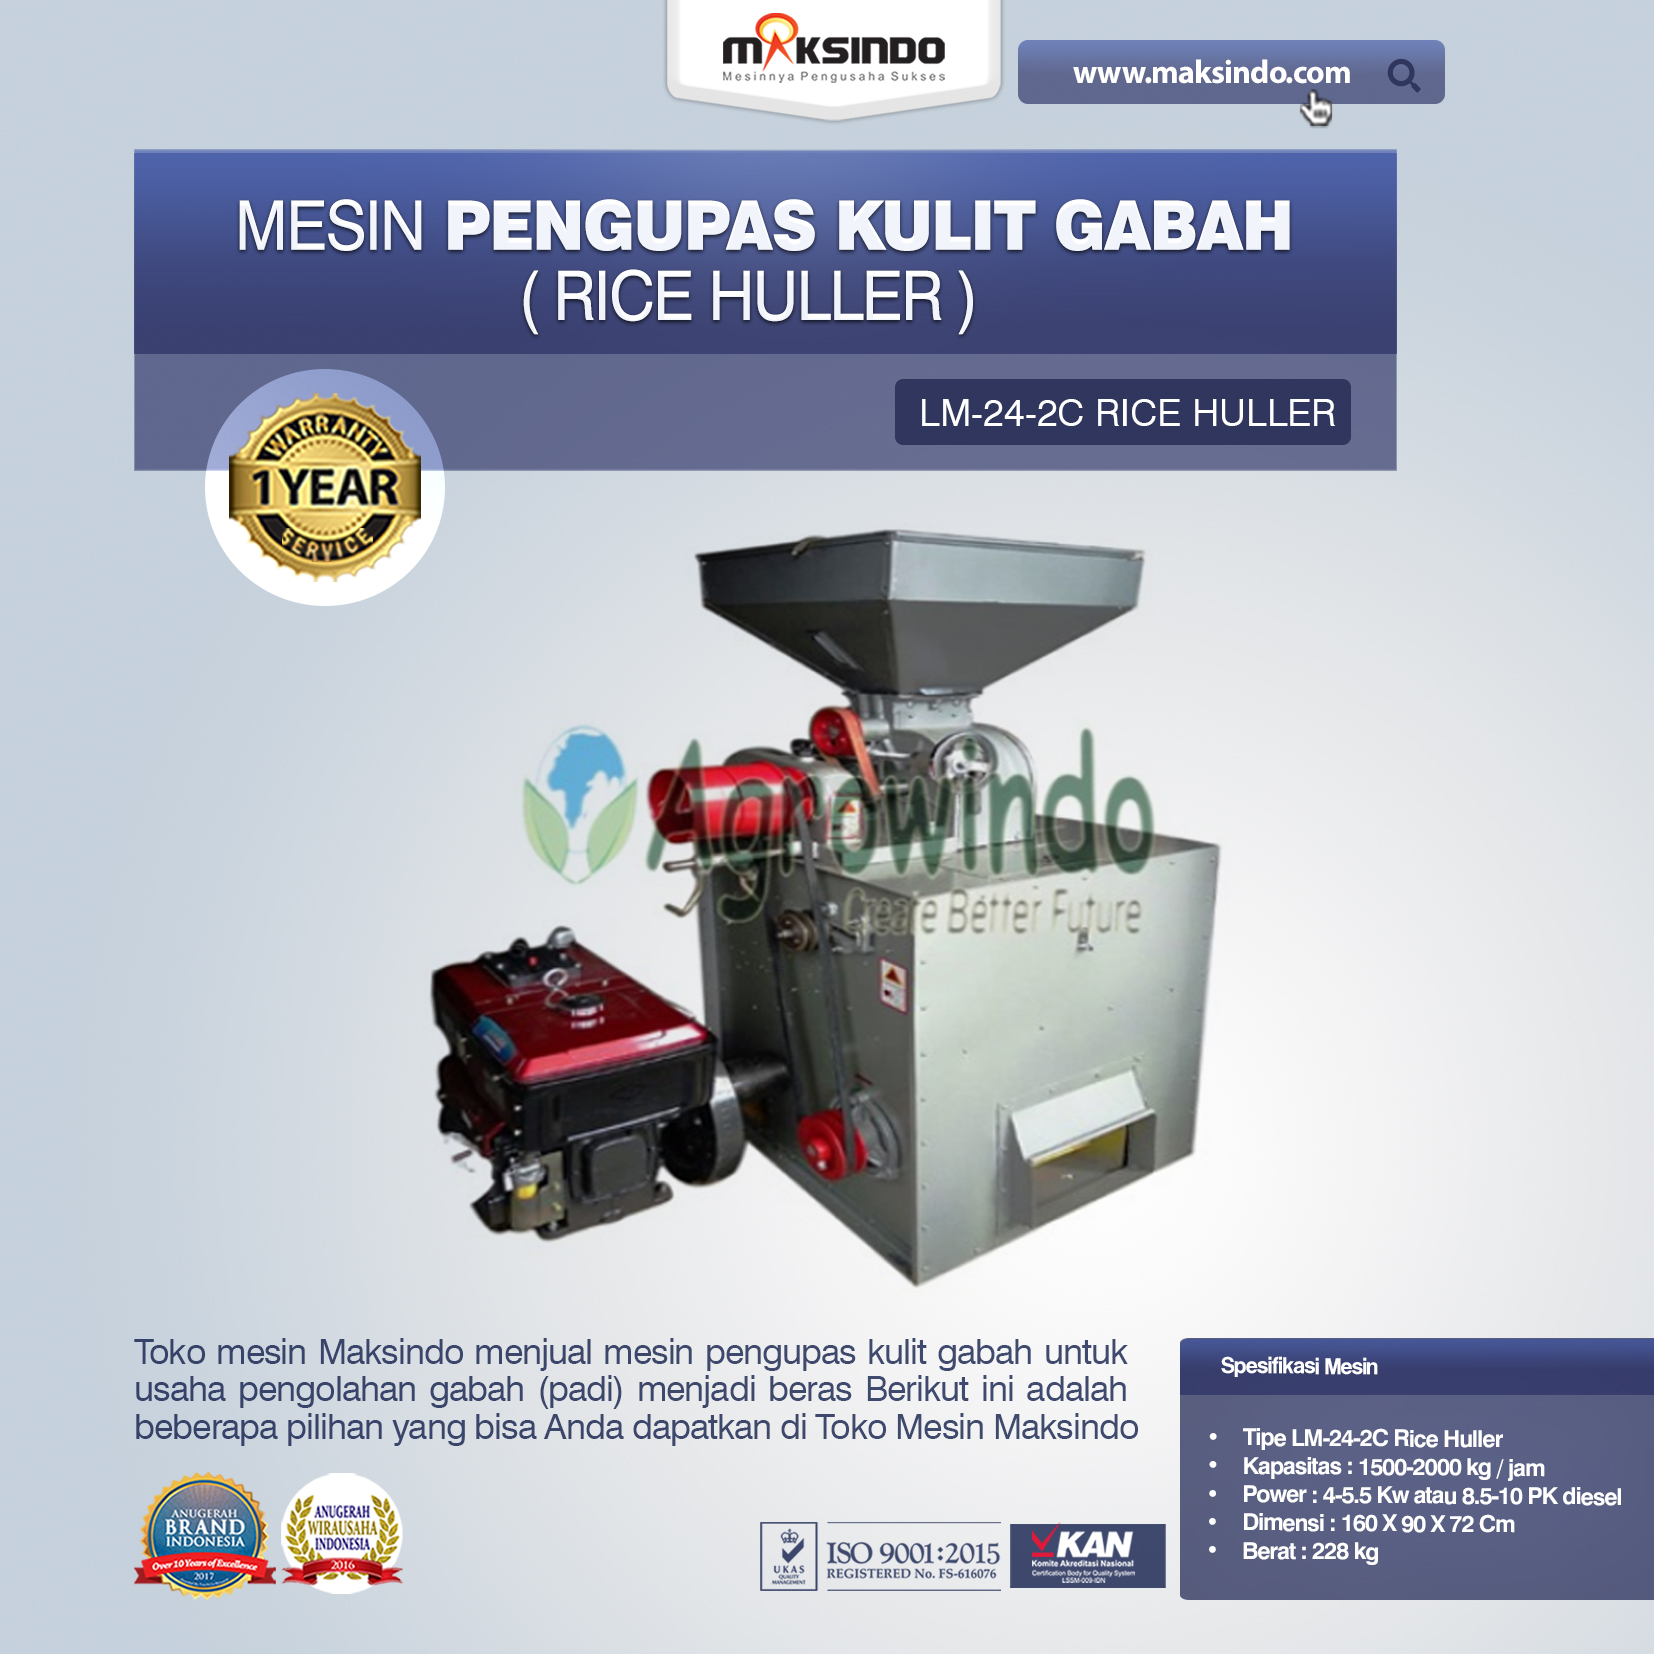 Jual Mesin Pengupas Kulit Gabah (rice huller) di Palembang